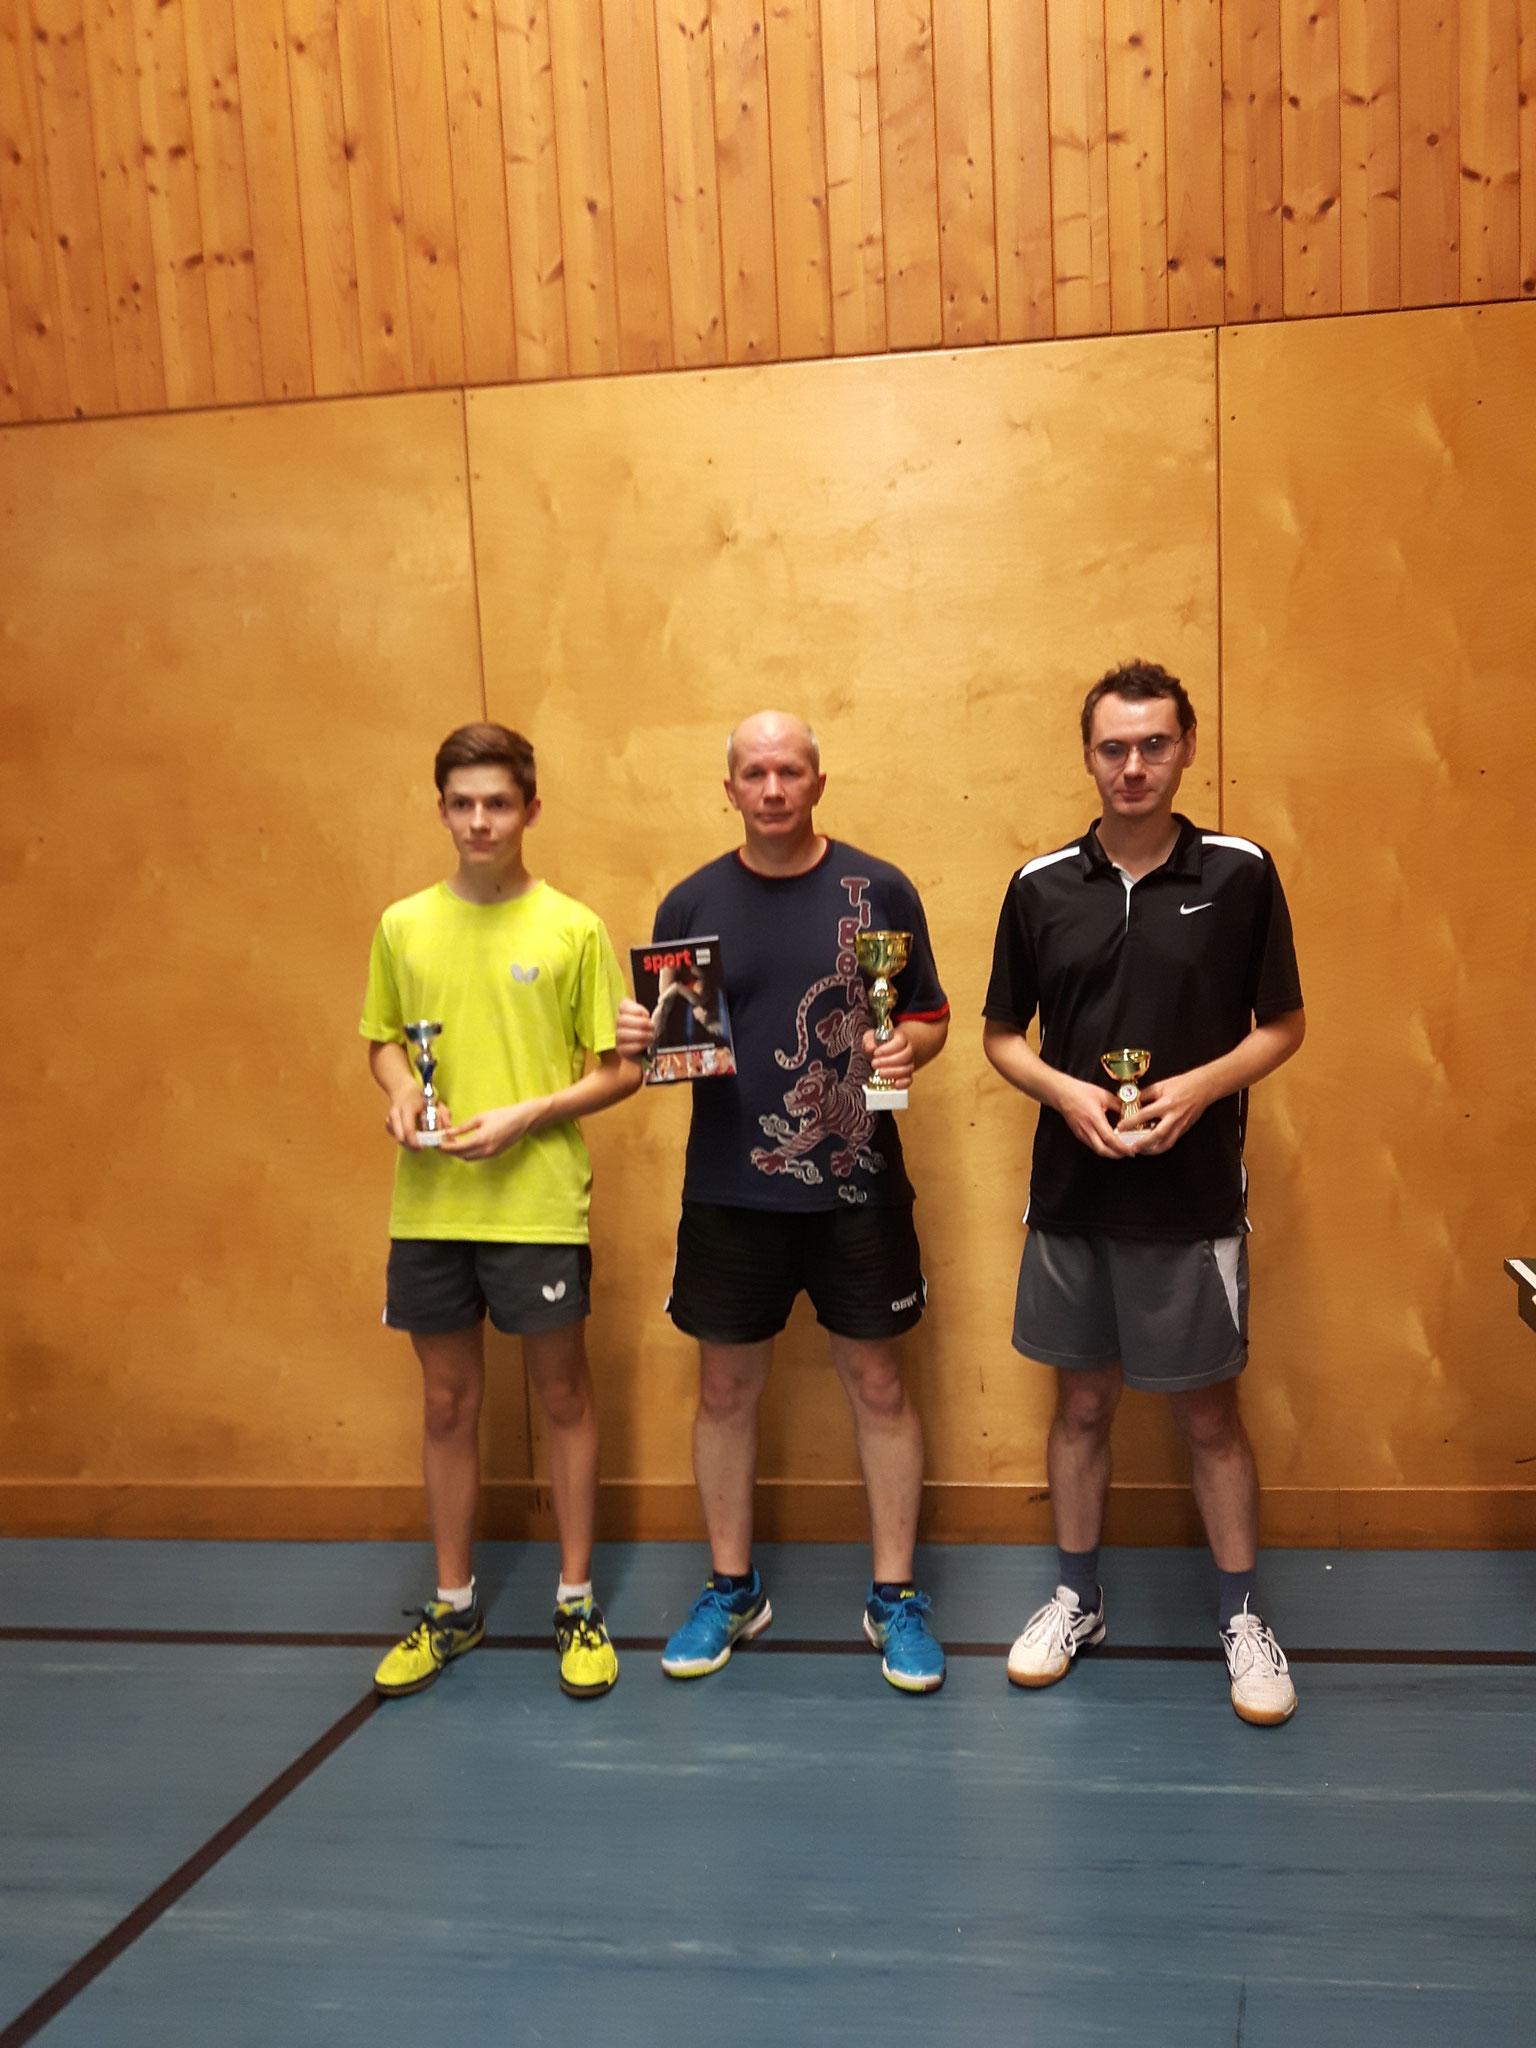 Siegerfoto Bewerb E: v.l.n.r. David Brandl (SSTO) (Platz 2), Endre Pelsöczi (URAP) (Sieger), Vladimir Kolmogorov (KLOS) (Platz 3)